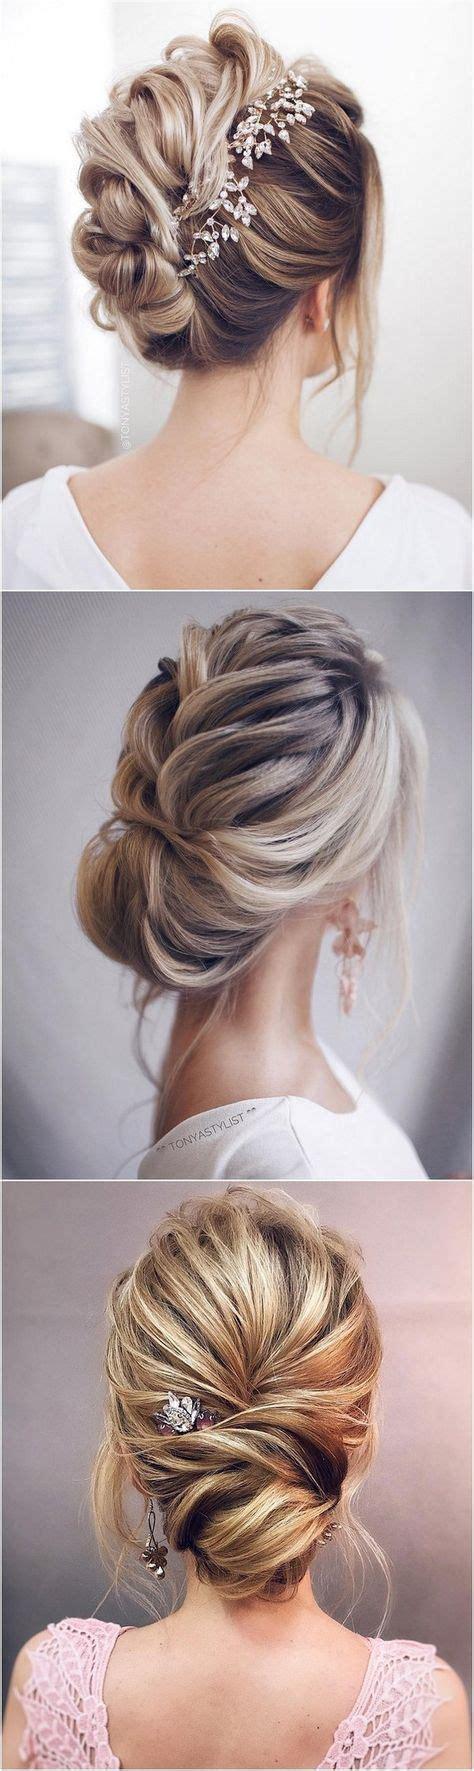 so pretty updo wedding hairstyles from tonyapushkareva